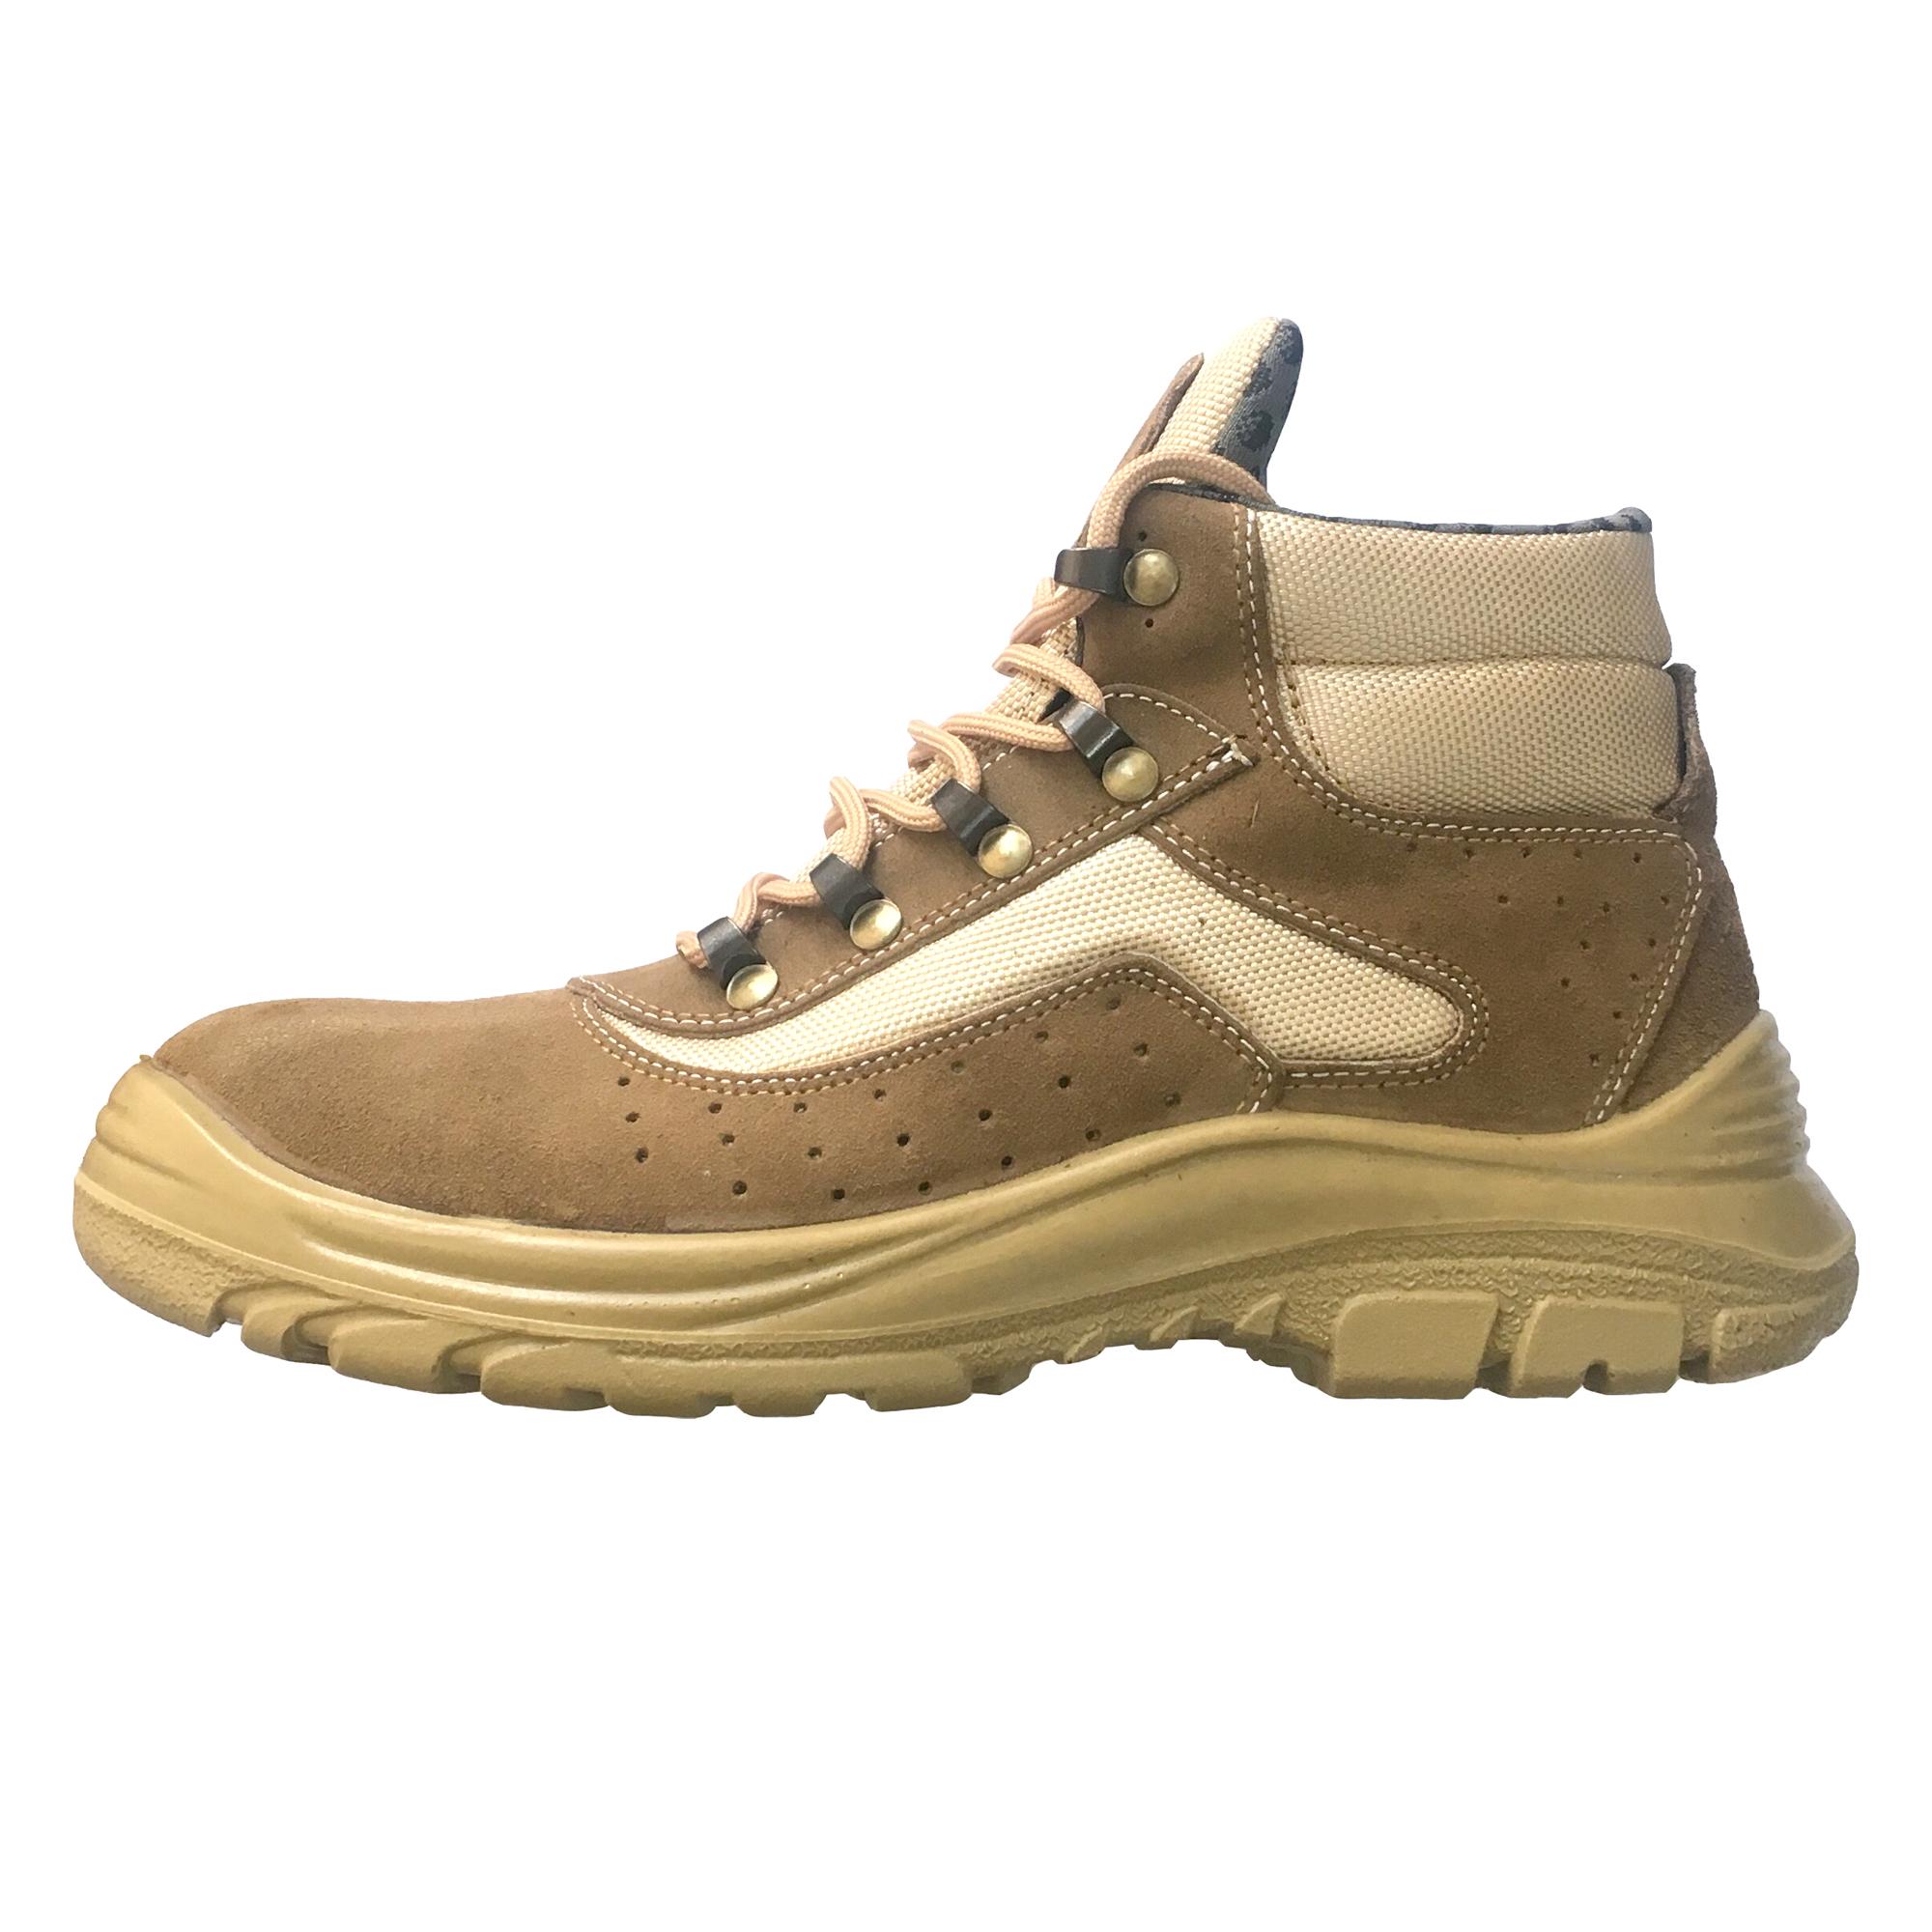 قیمت کفش کوهنوردی مردانه ارک مدل ریما